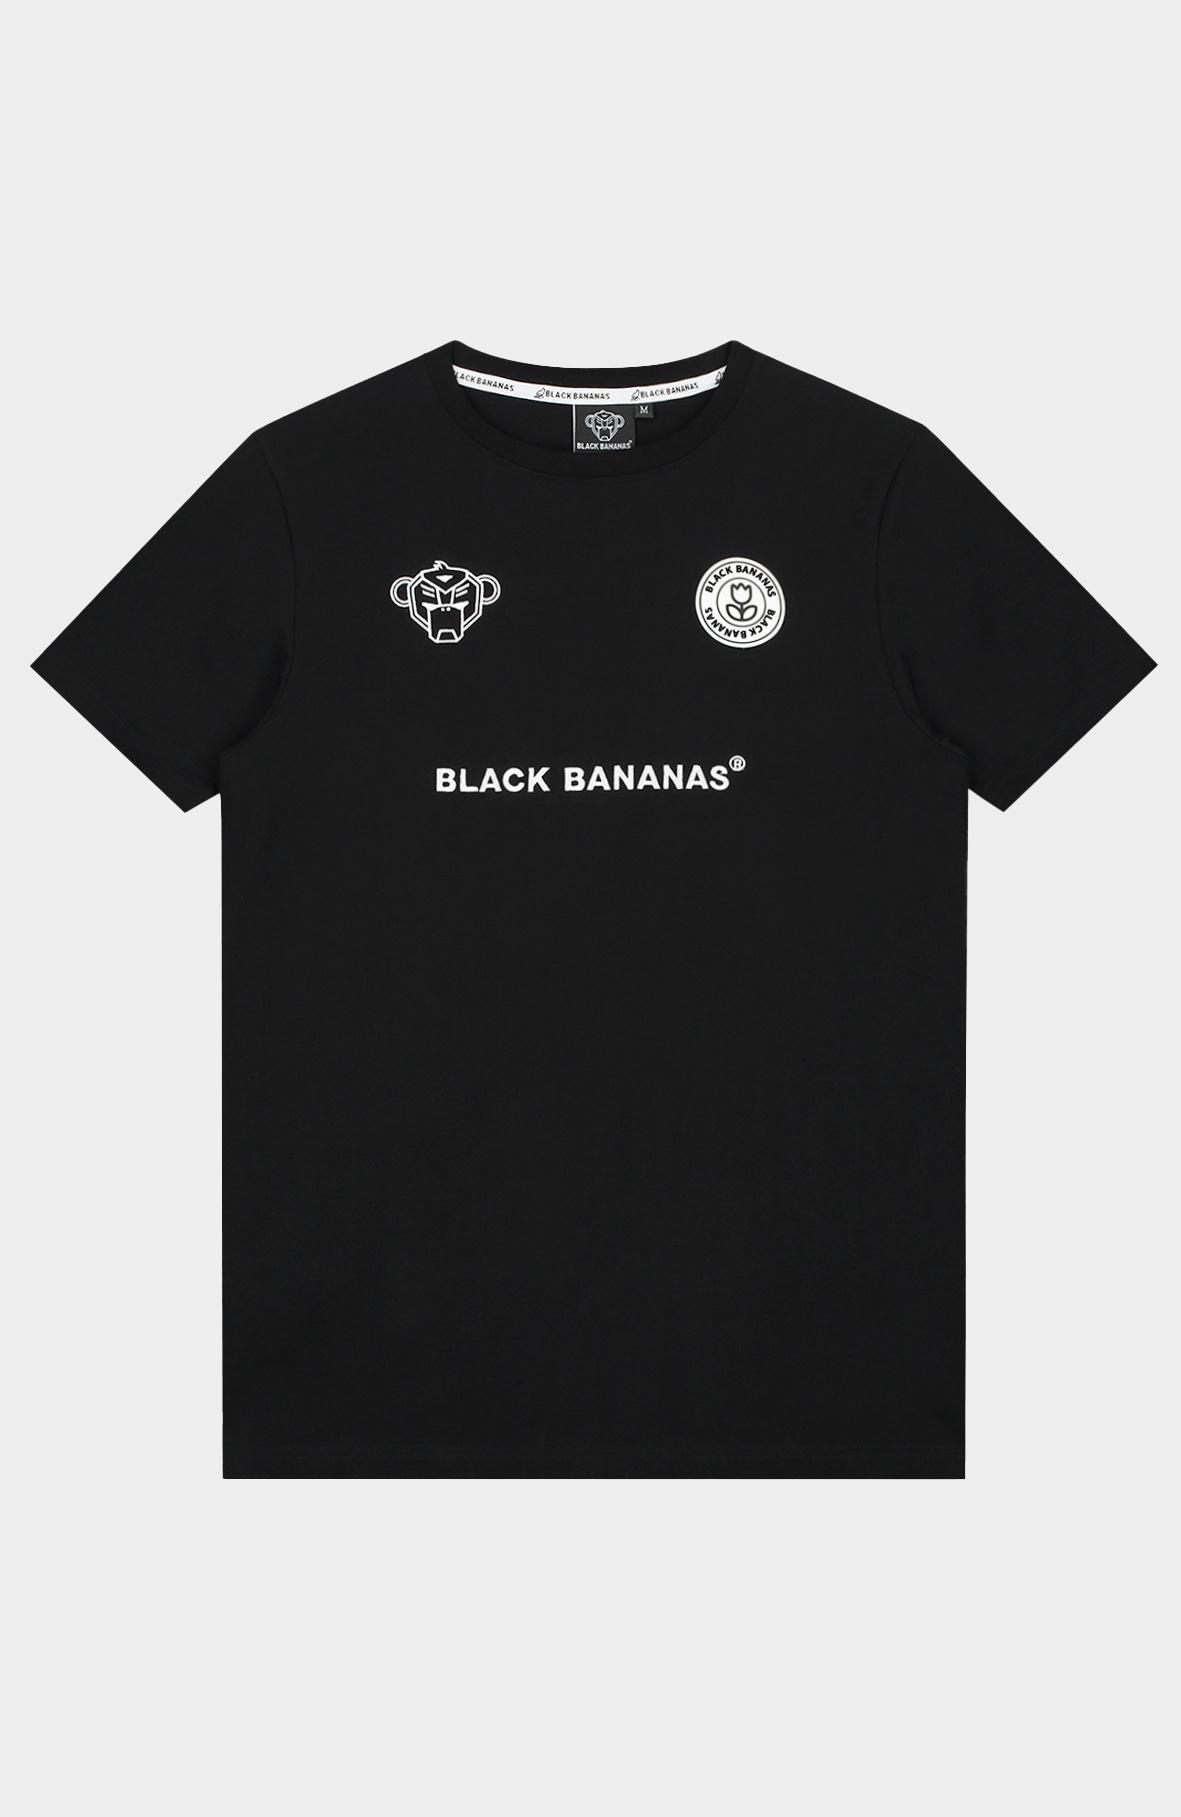 Black Bananas  F.C. T-shirt BLACK